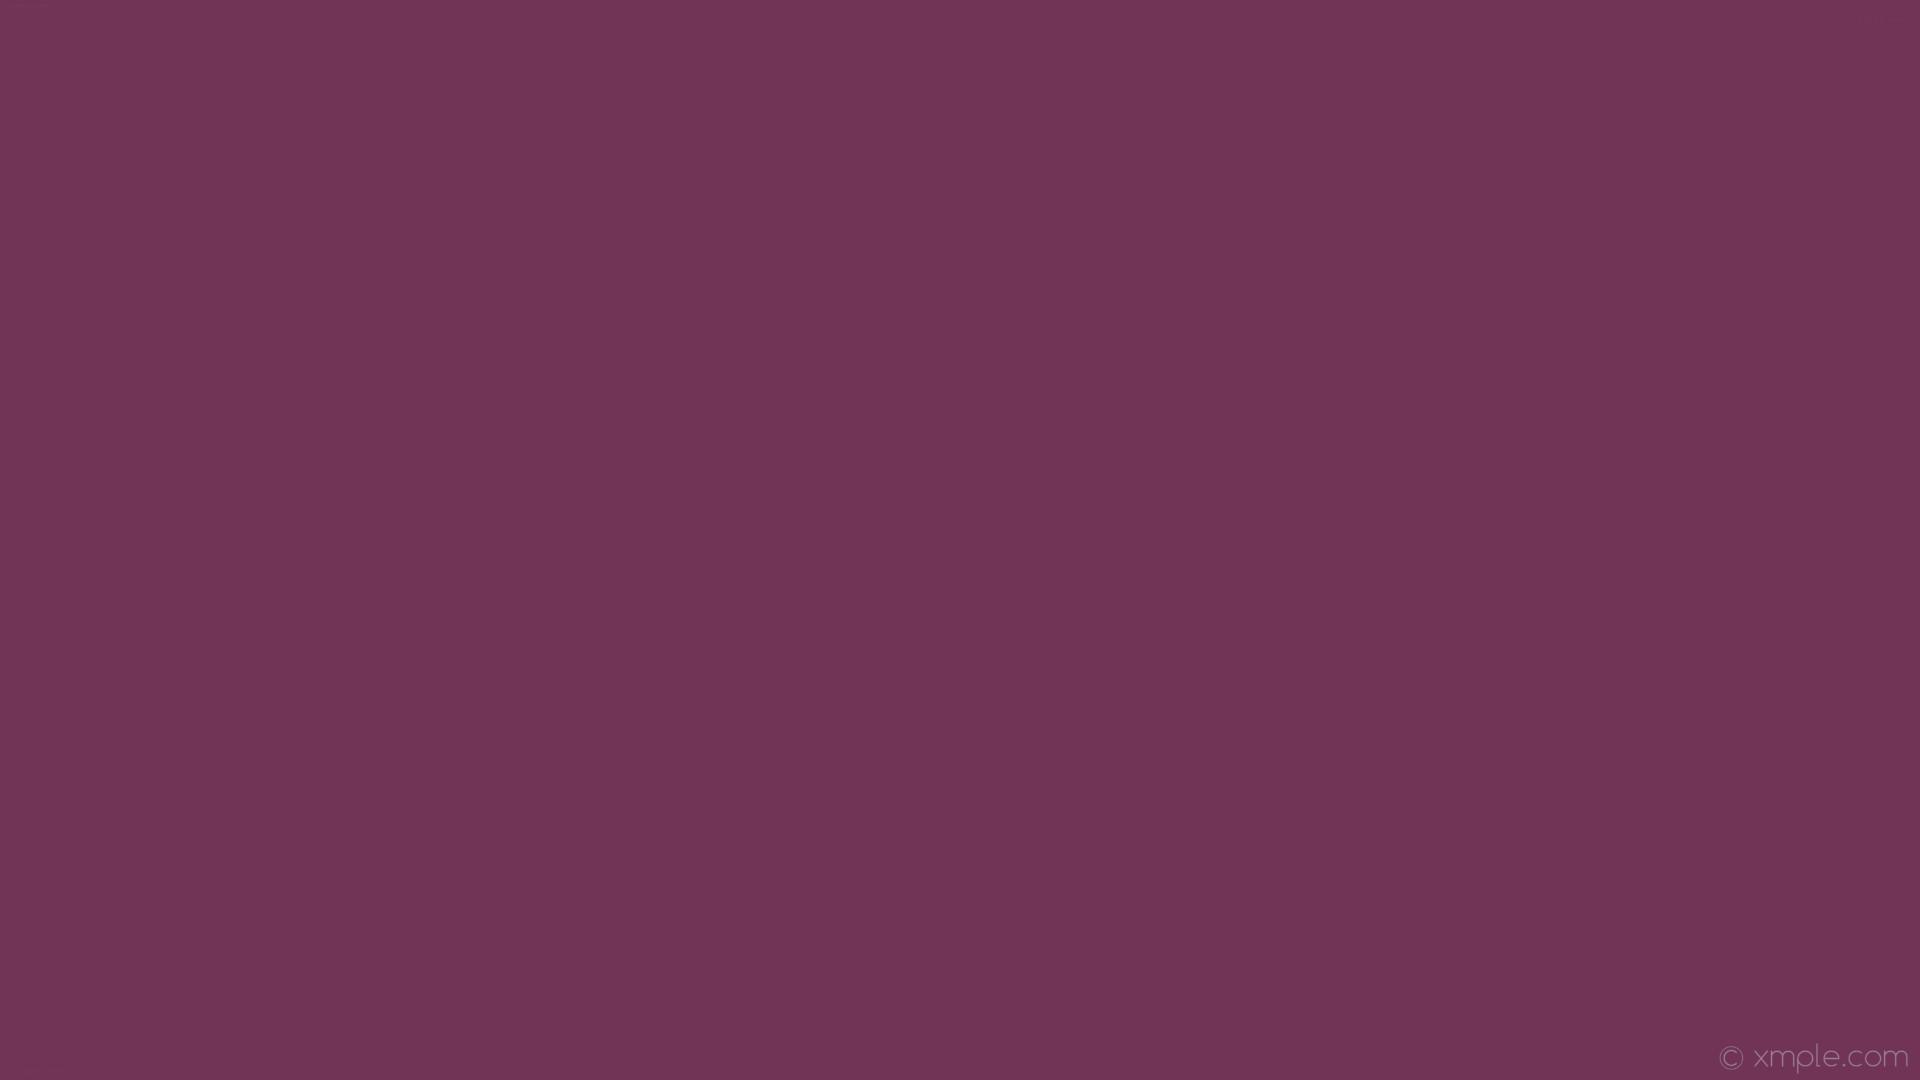 wallpaper one colour solid color pink single plain #713356